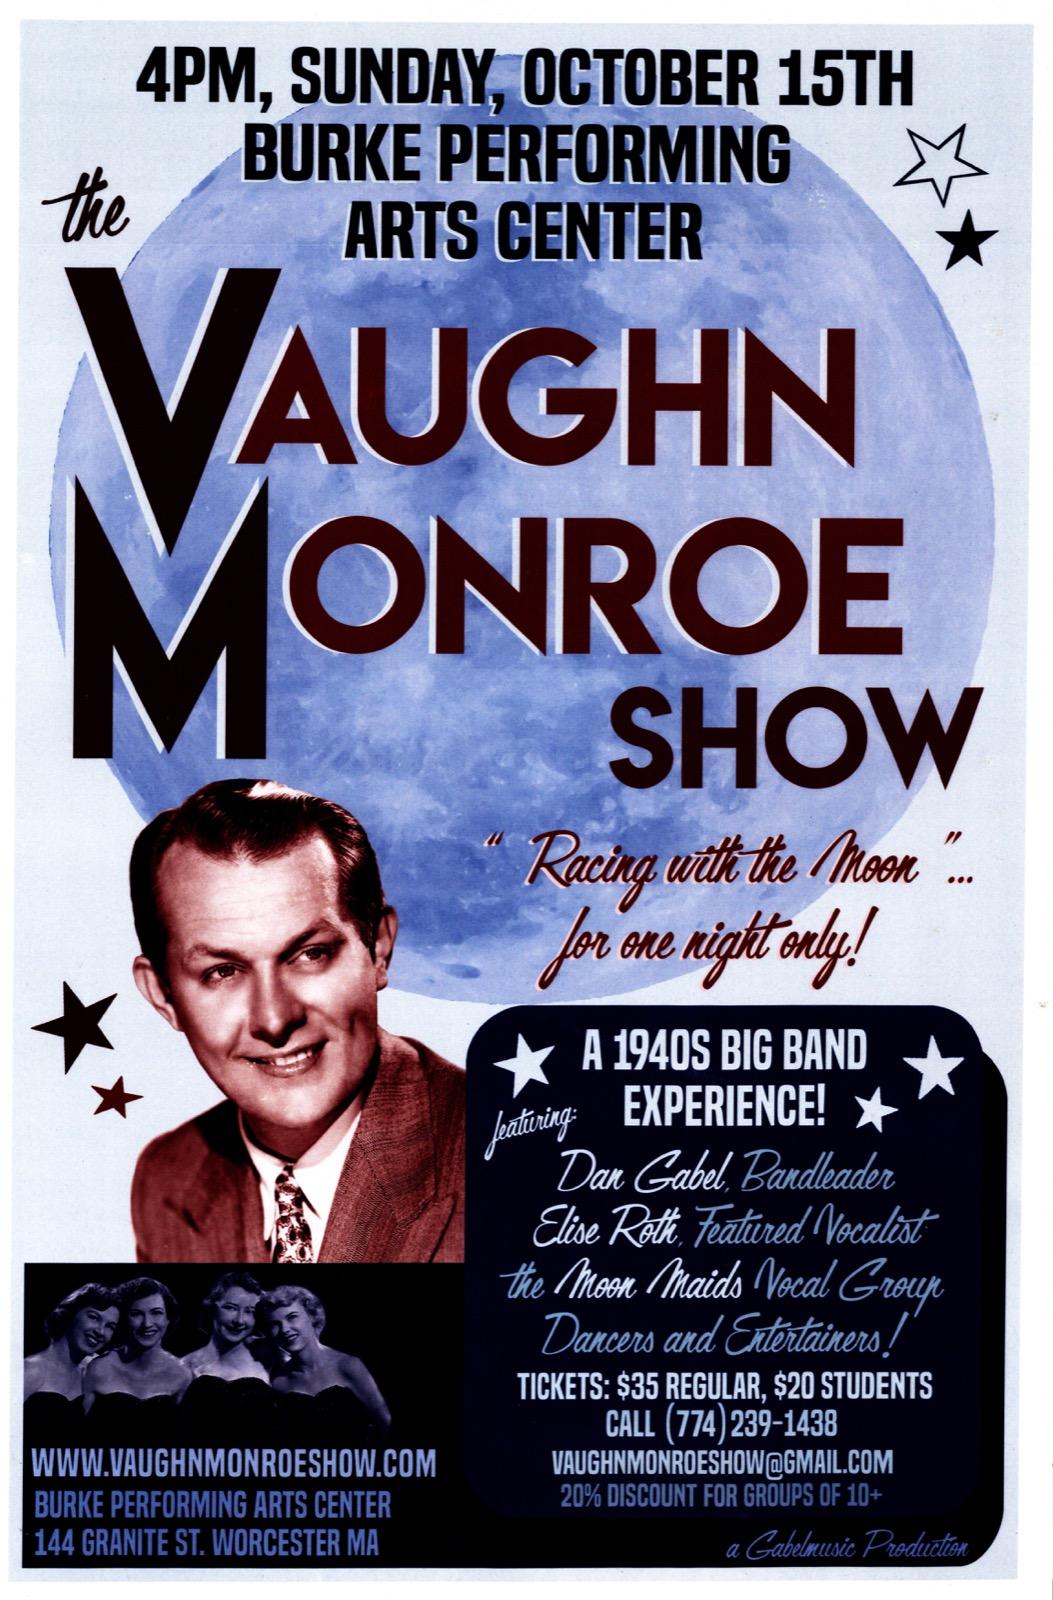 Vaughn_Monroe_Show.jpg